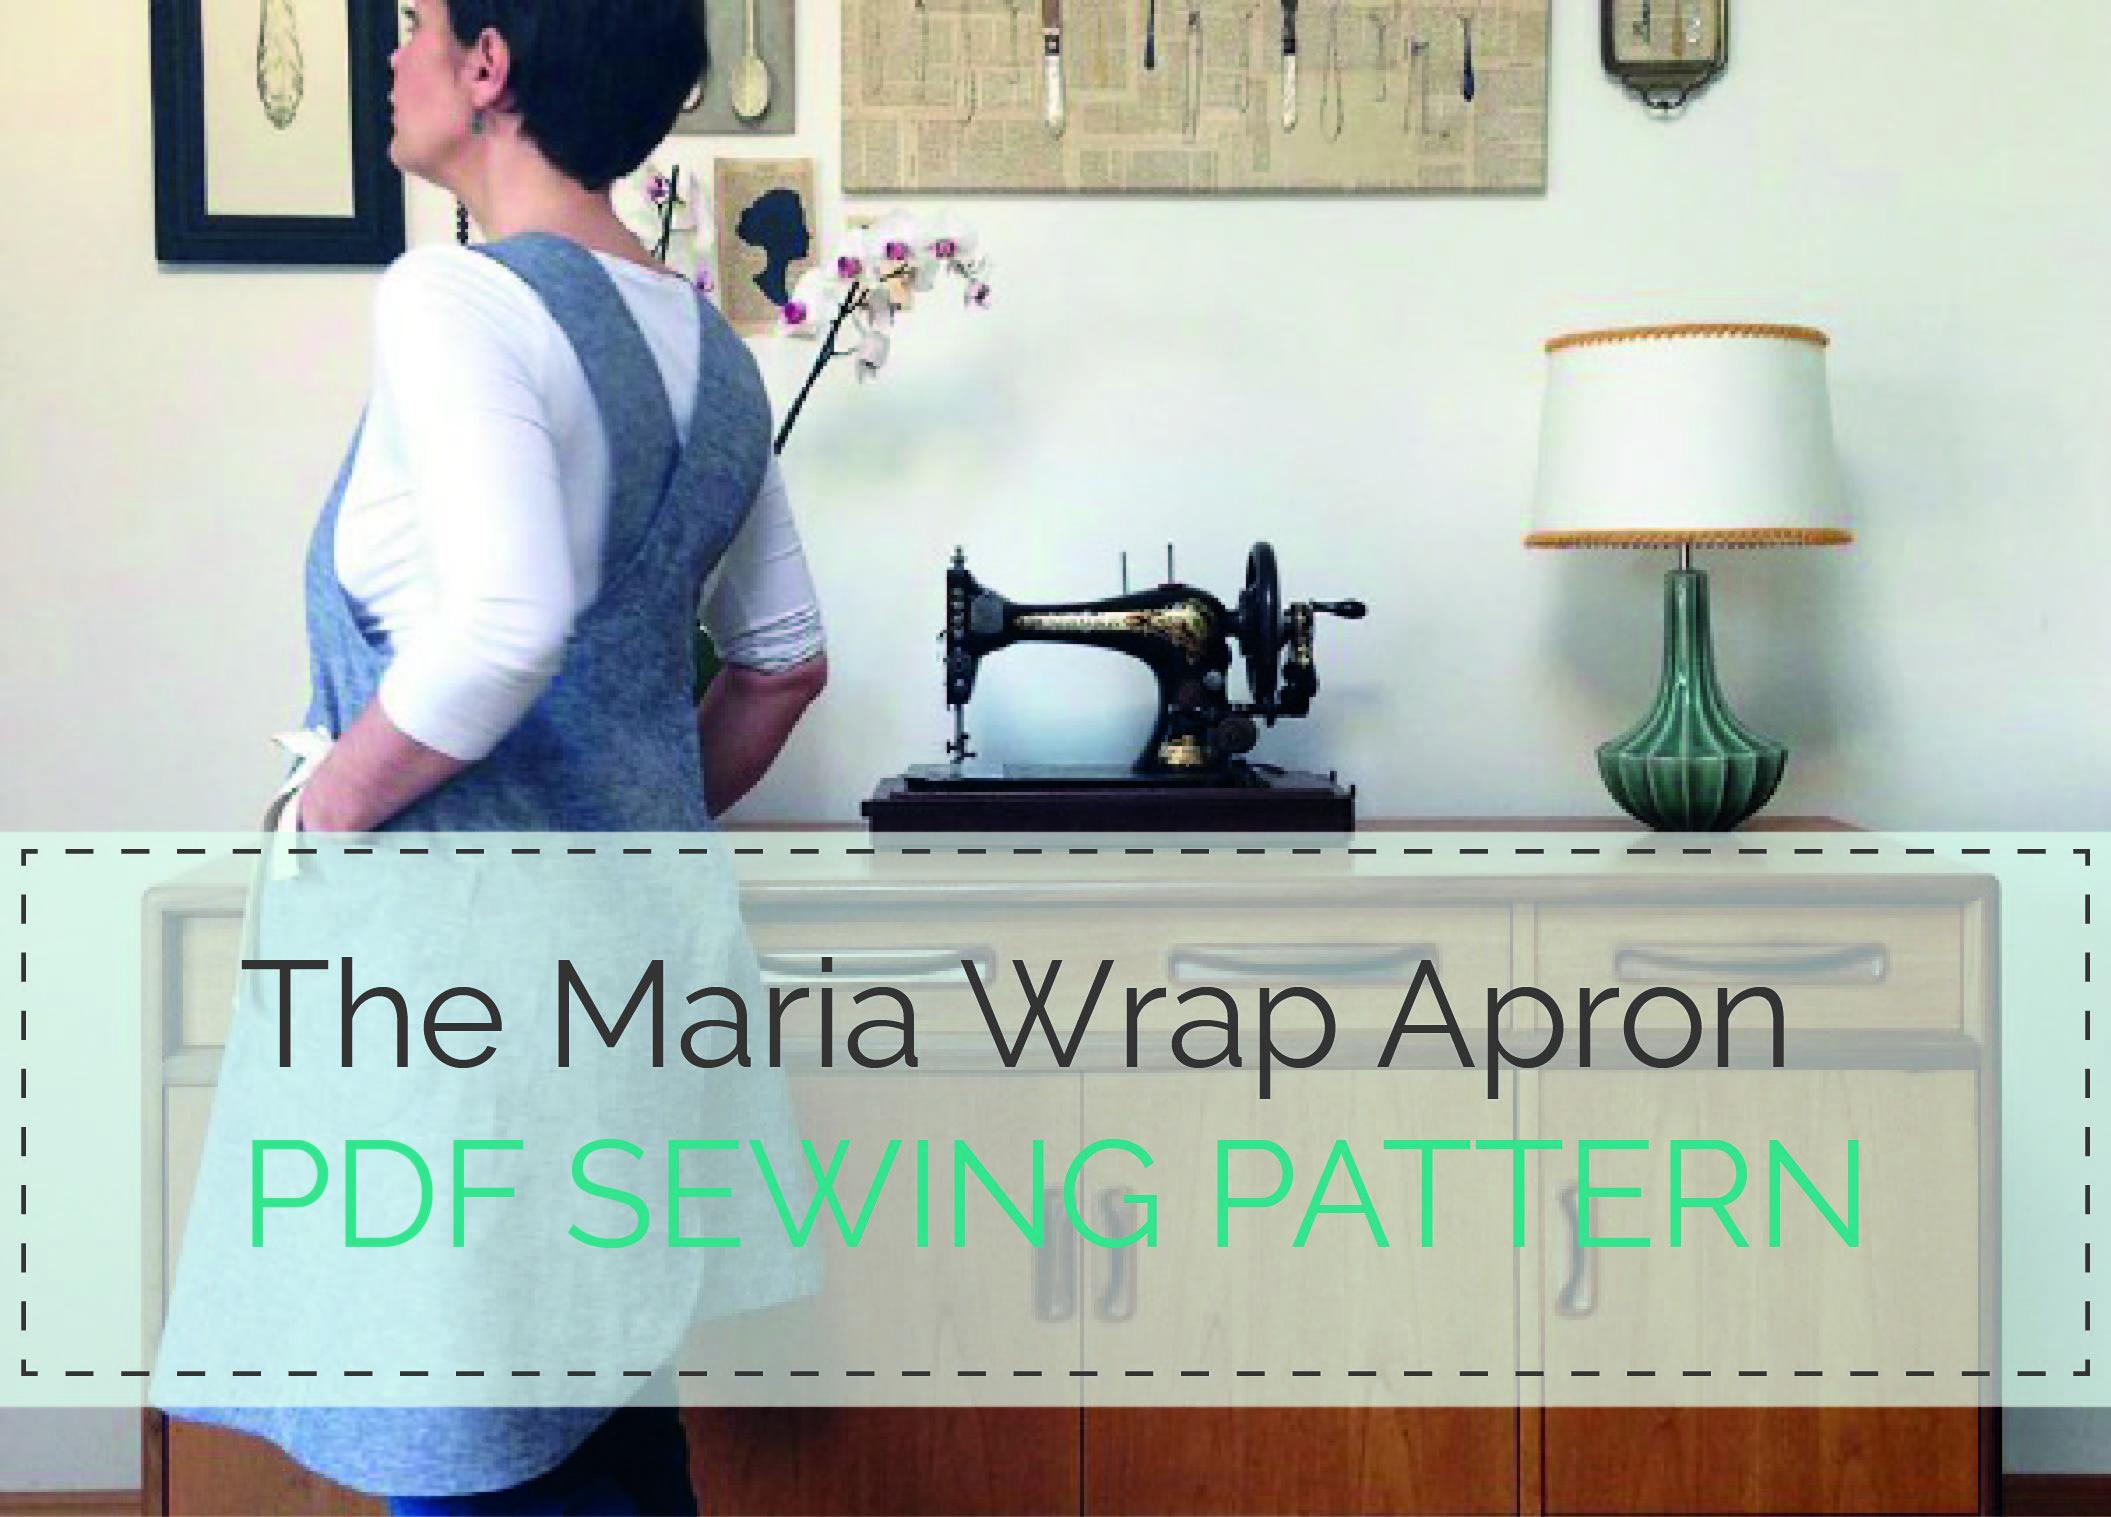 The Maria Wrap Apron - PDF Sewing Pattern